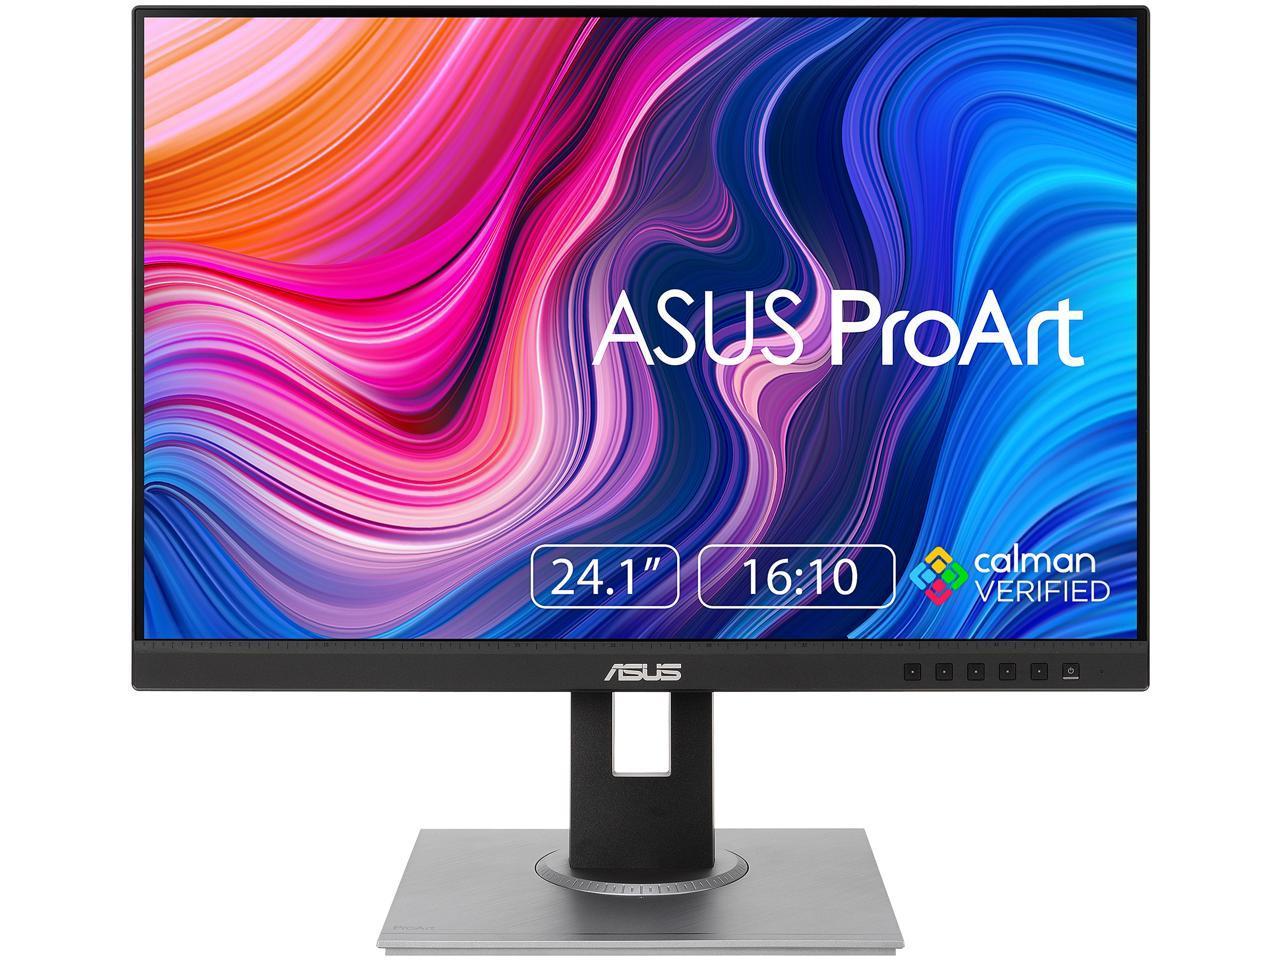 Asus Proart Display Pa248qv 24 1 Wuxga 1920 X 1200 16 10 Professional Monitor 100 Srgb Rec 709 Delta E 2 Ips Displayport Hdmi D Sub Tilt Pivot Swivel Height Adjustable Newegg Com